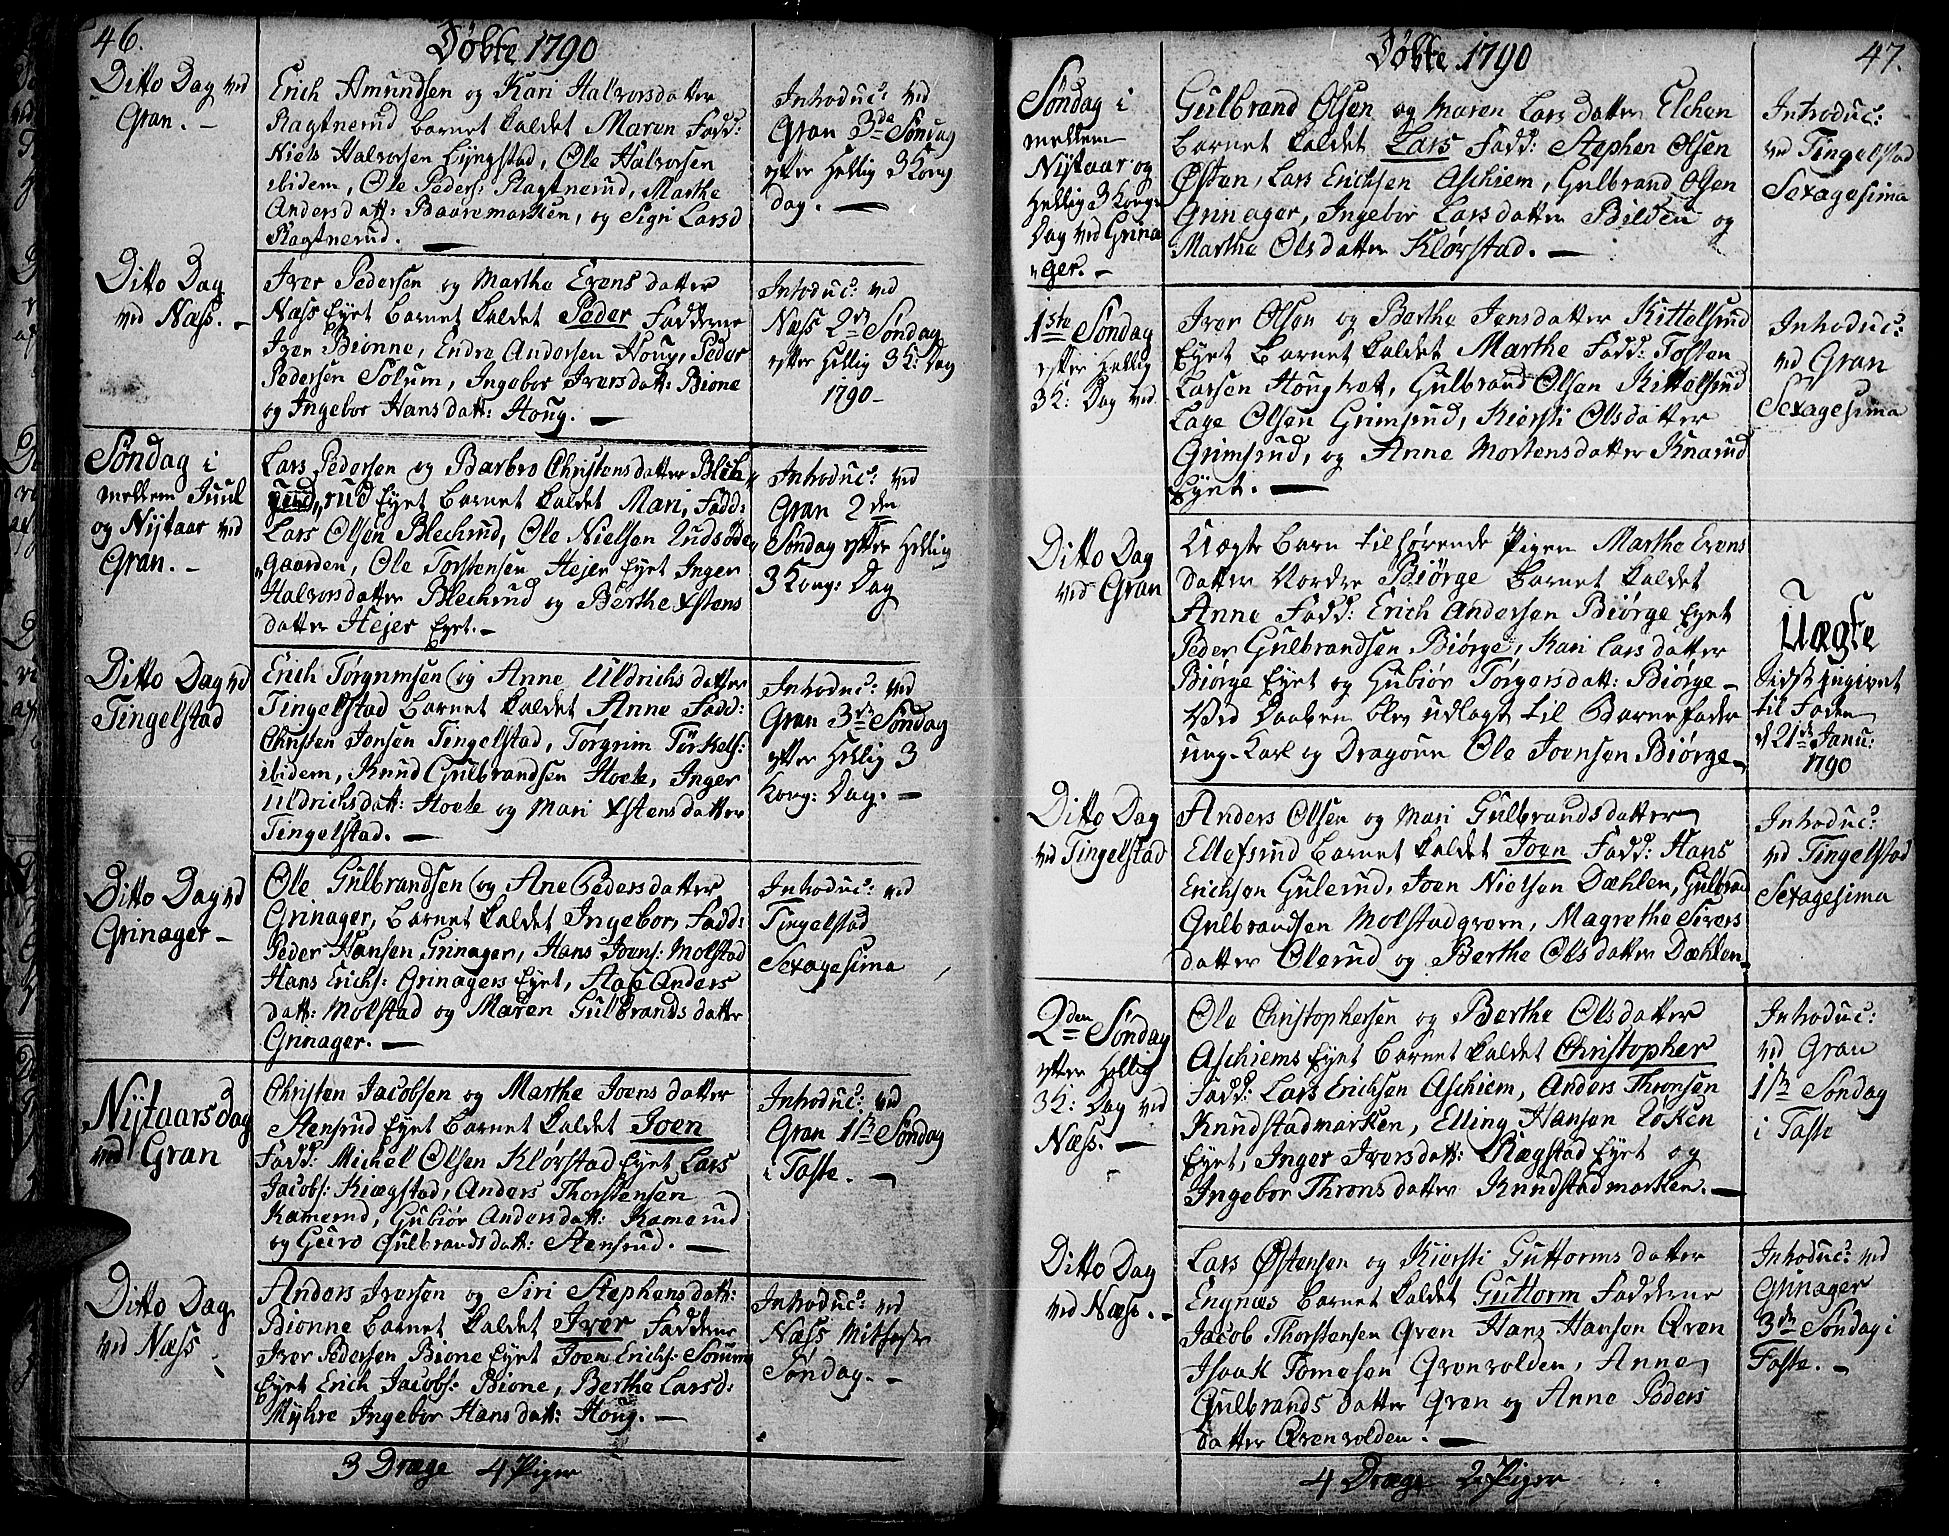 SAH, Gran prestekontor, Ministerialbok nr. 6, 1787-1824, s. 46-47